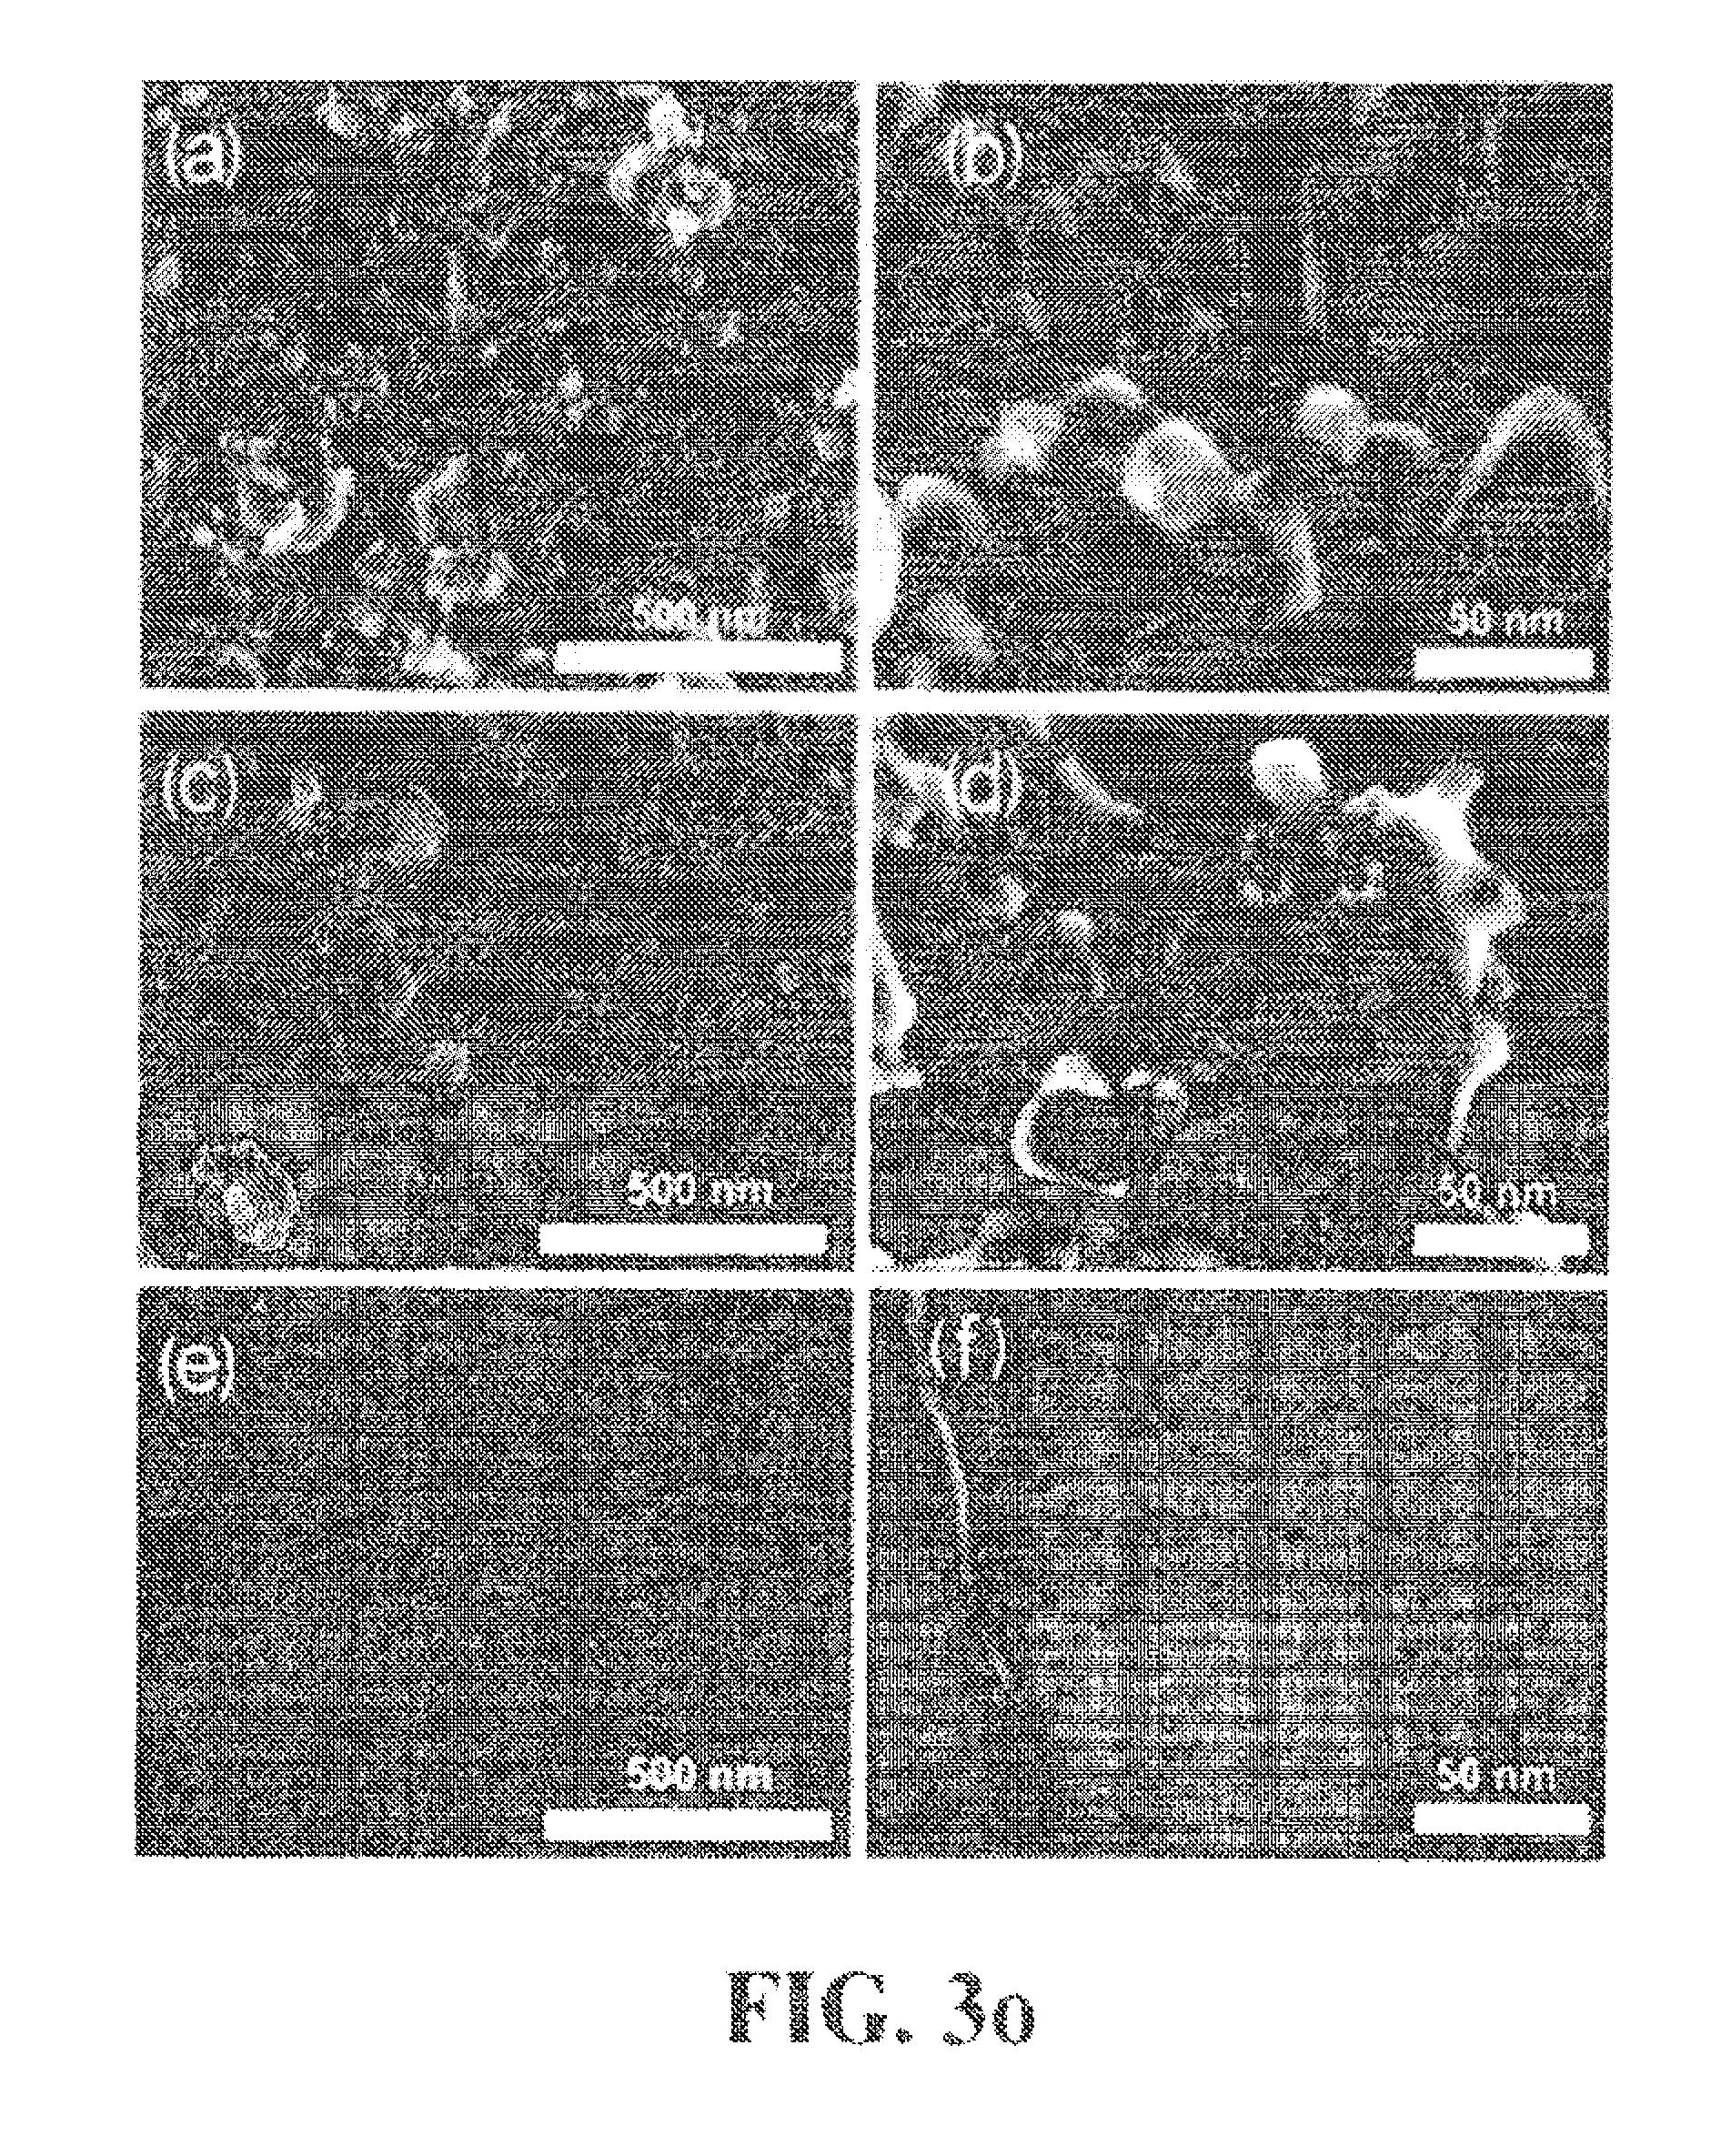 Patent US 8 530 940 B2